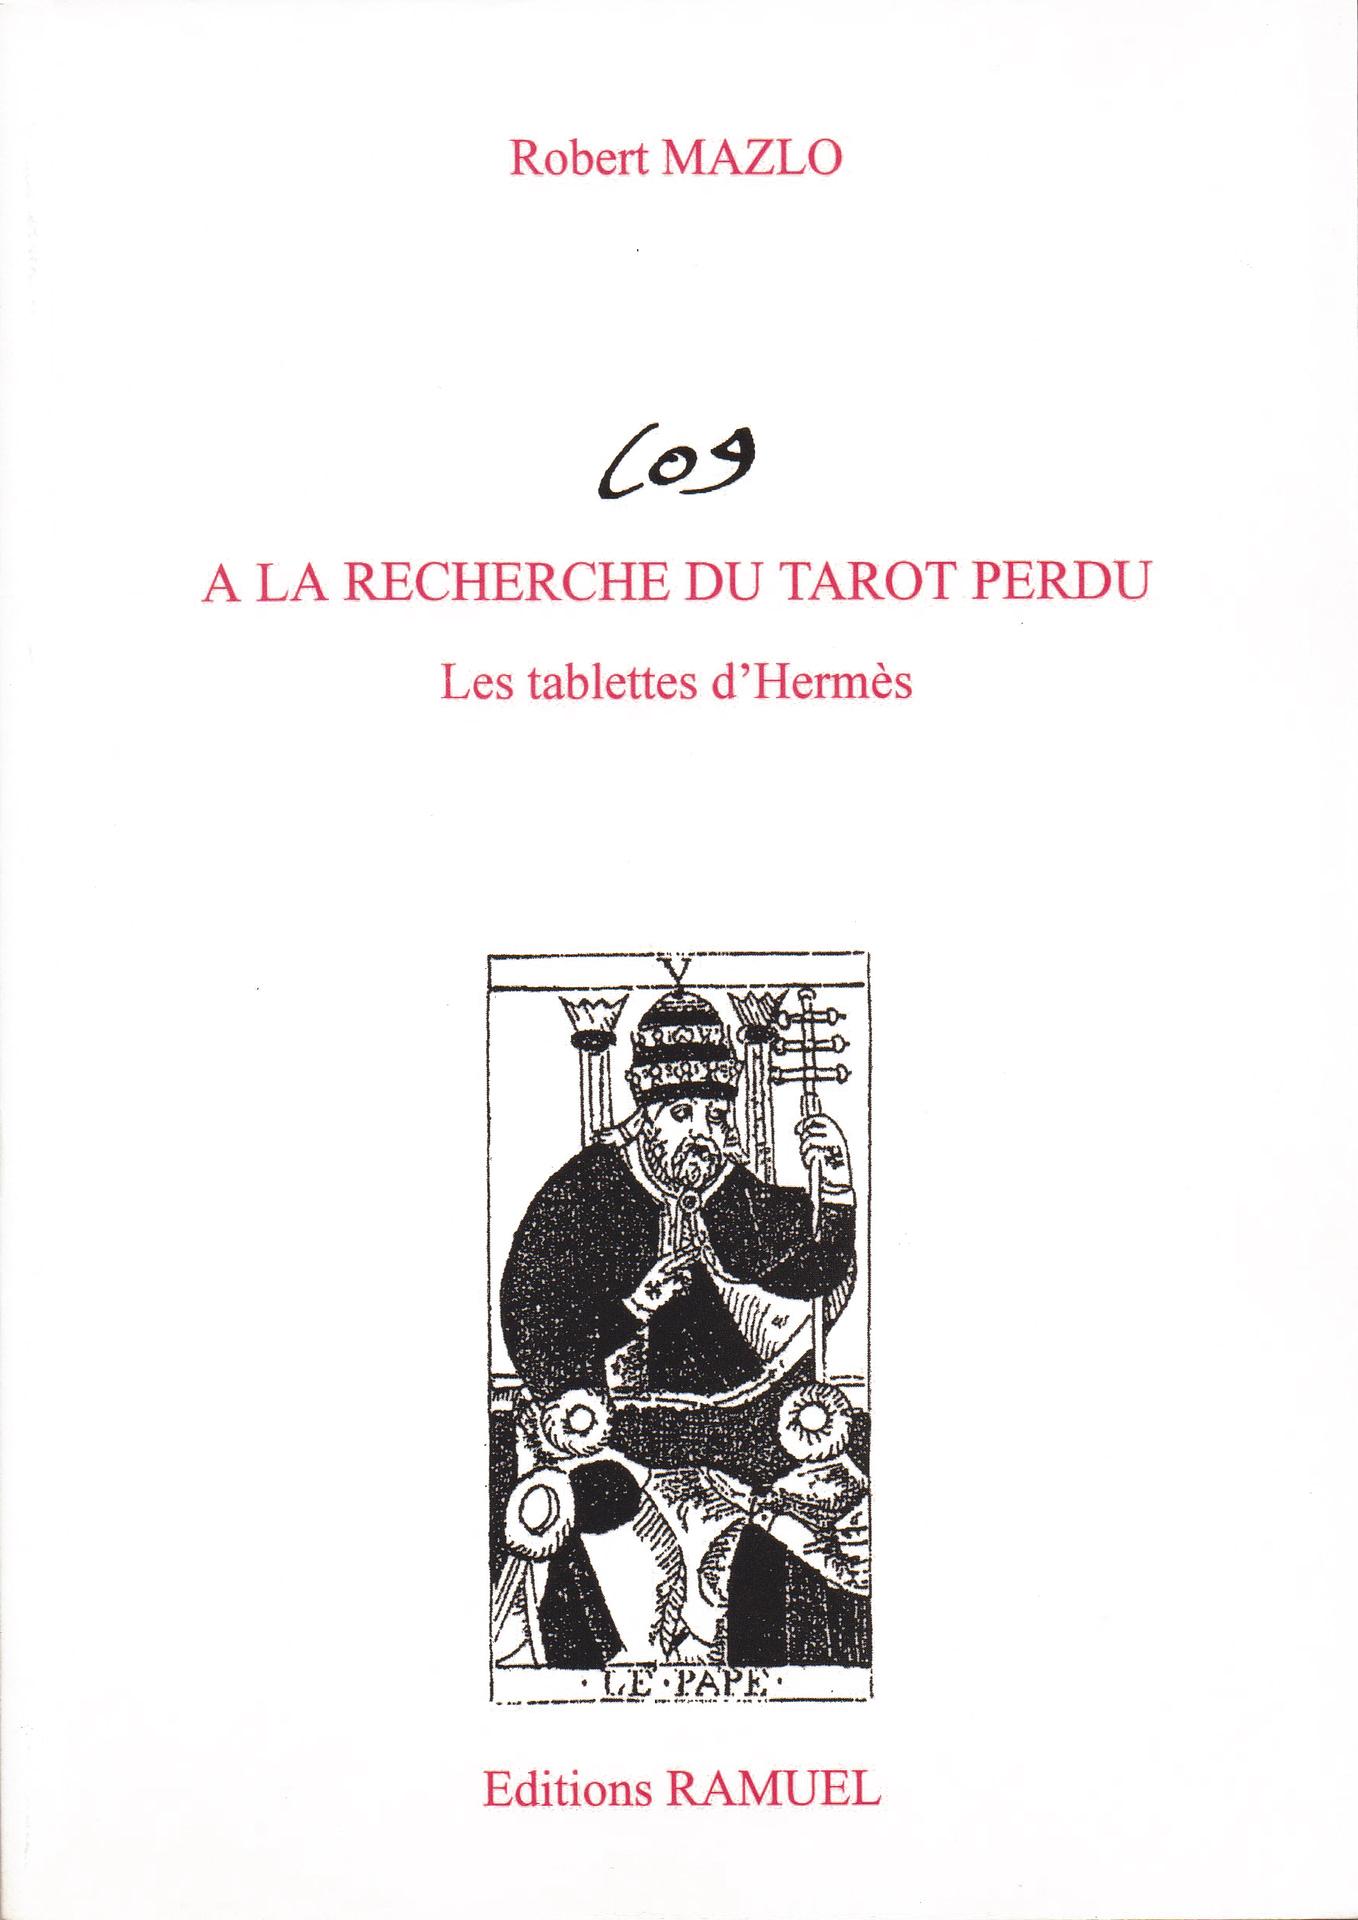 robert-mazlo-les-tablettes-dhermes